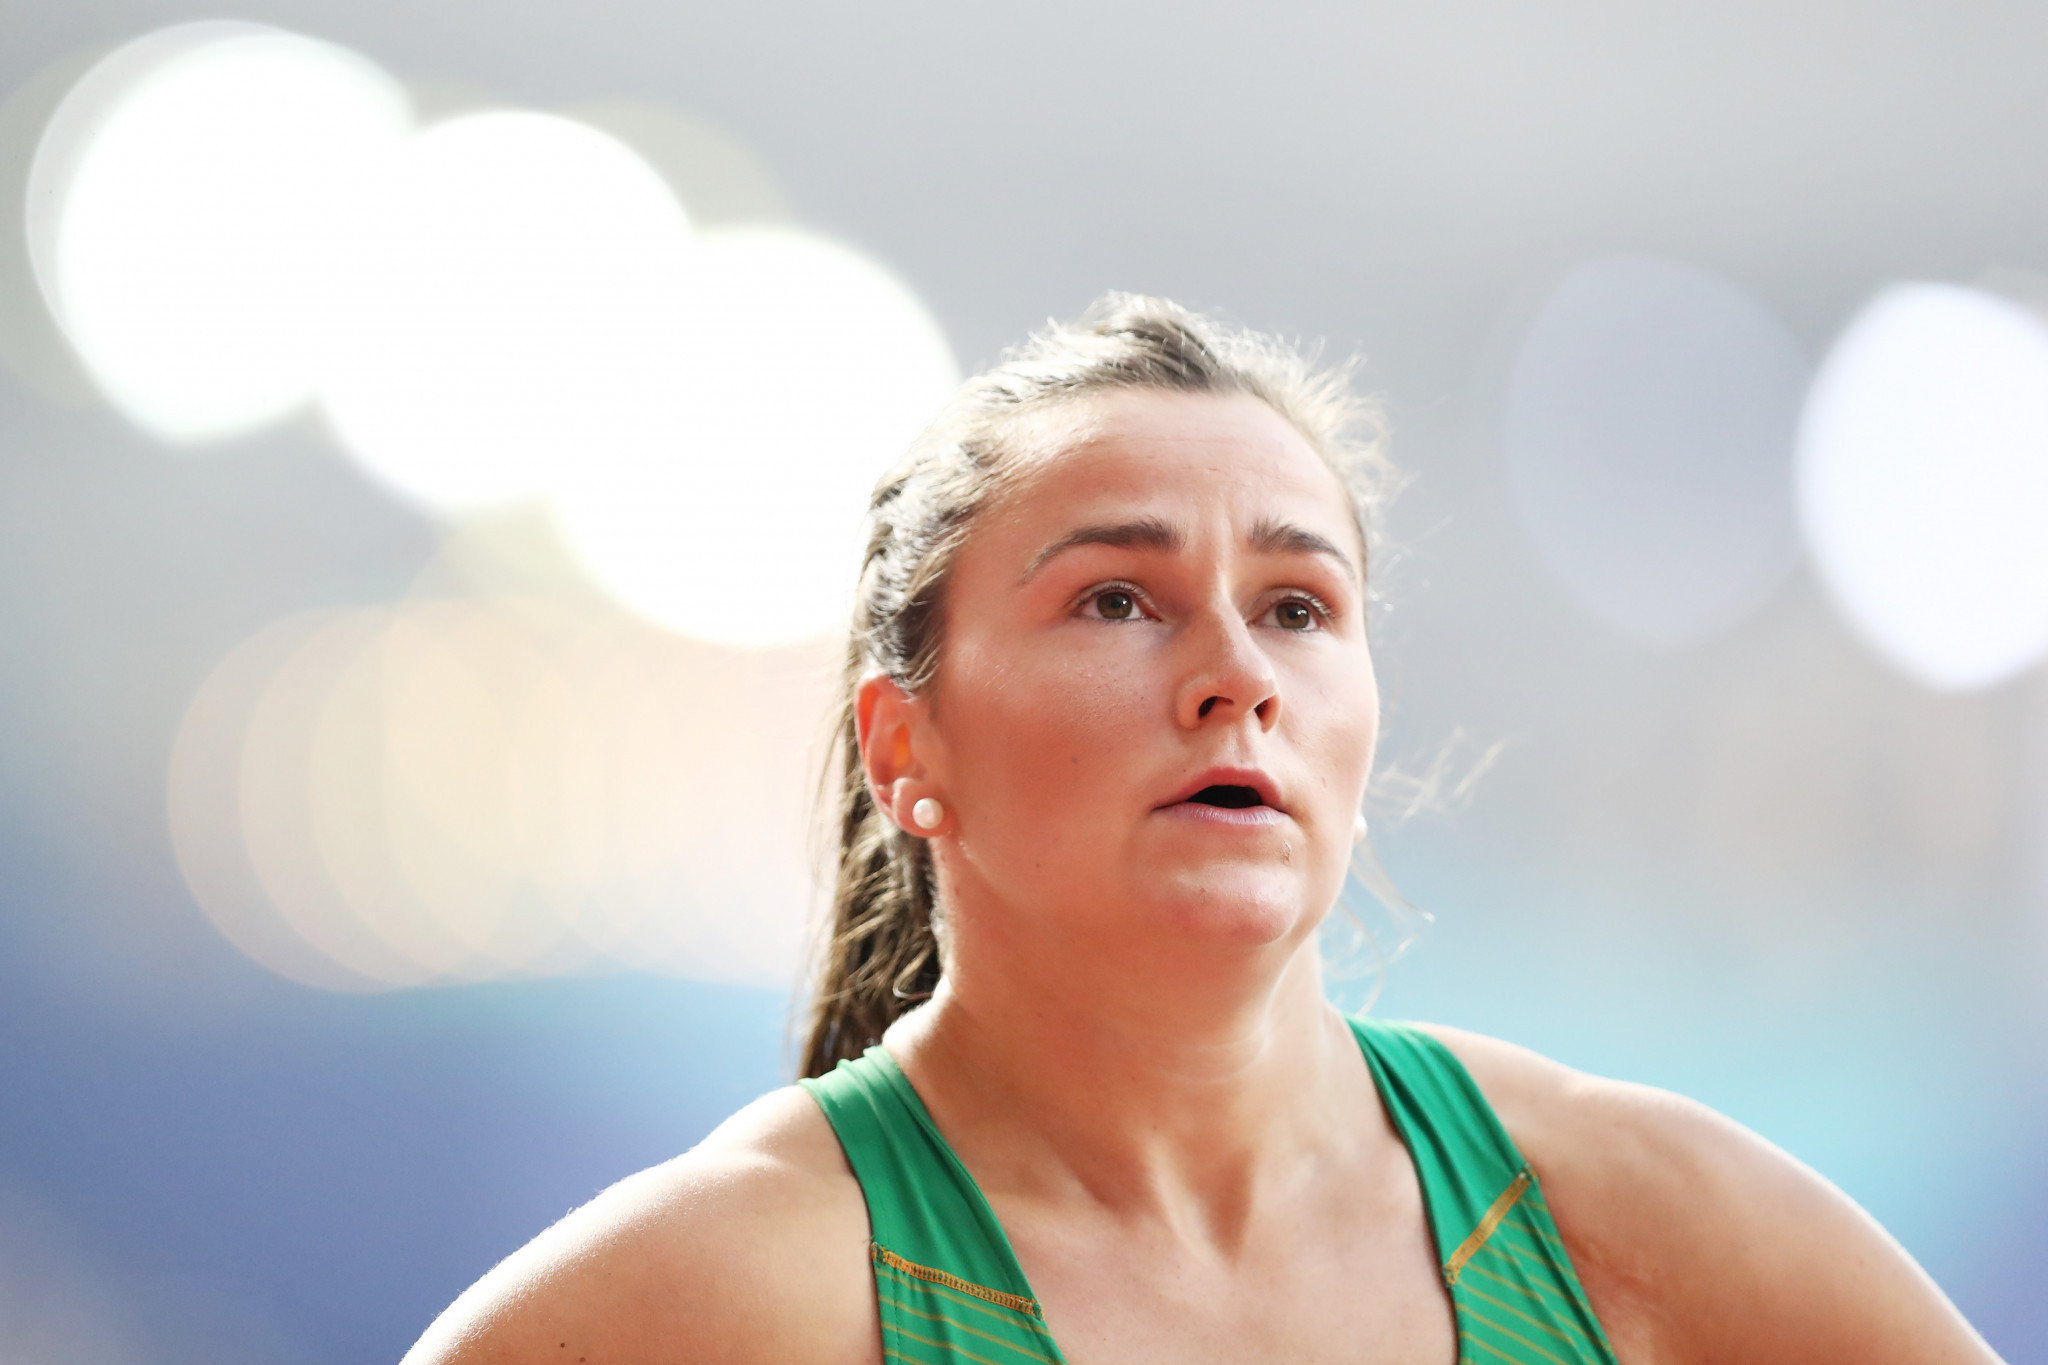 Irish sprinter backs World Athletics' Olympic qualification freeze